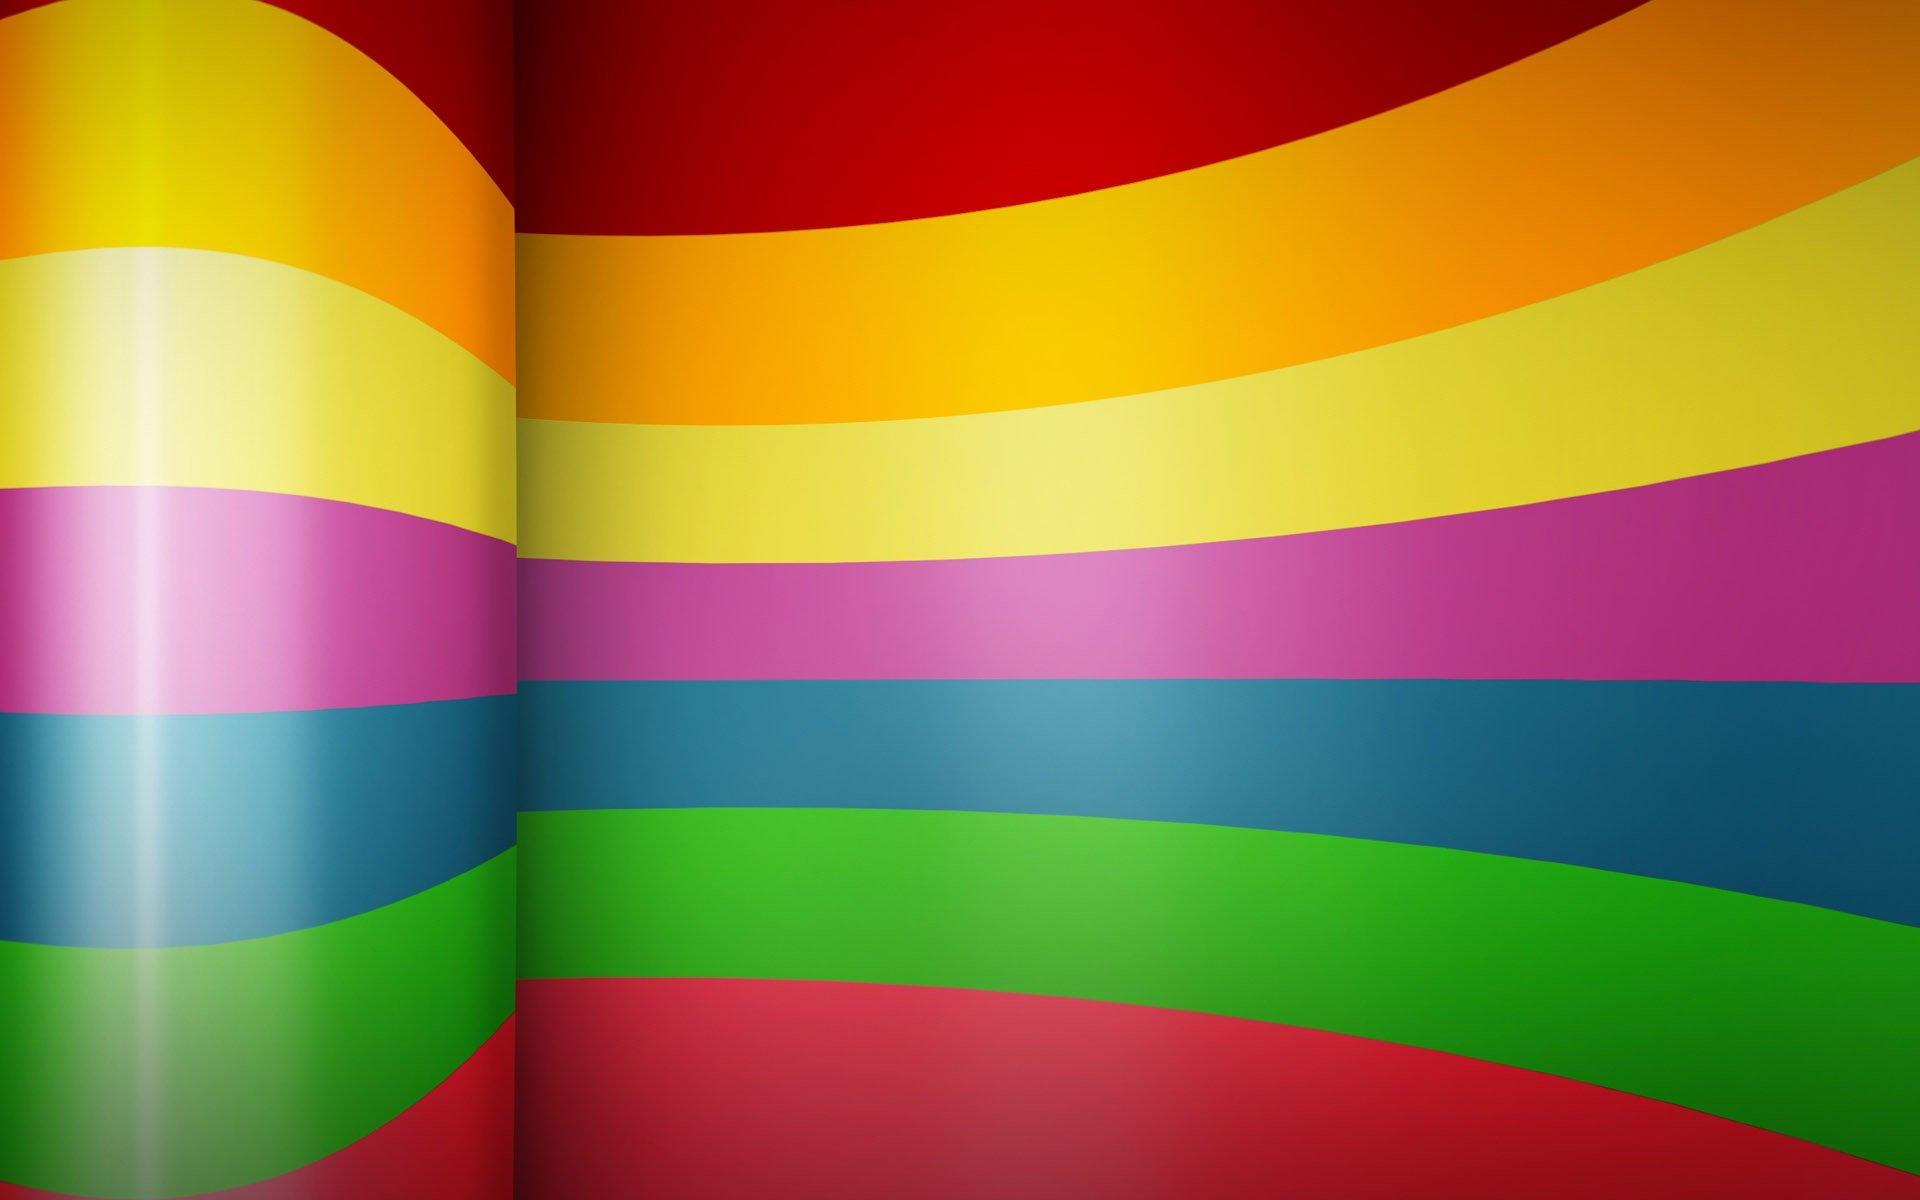 Colorful Wall HD wallpaper 1920x1200